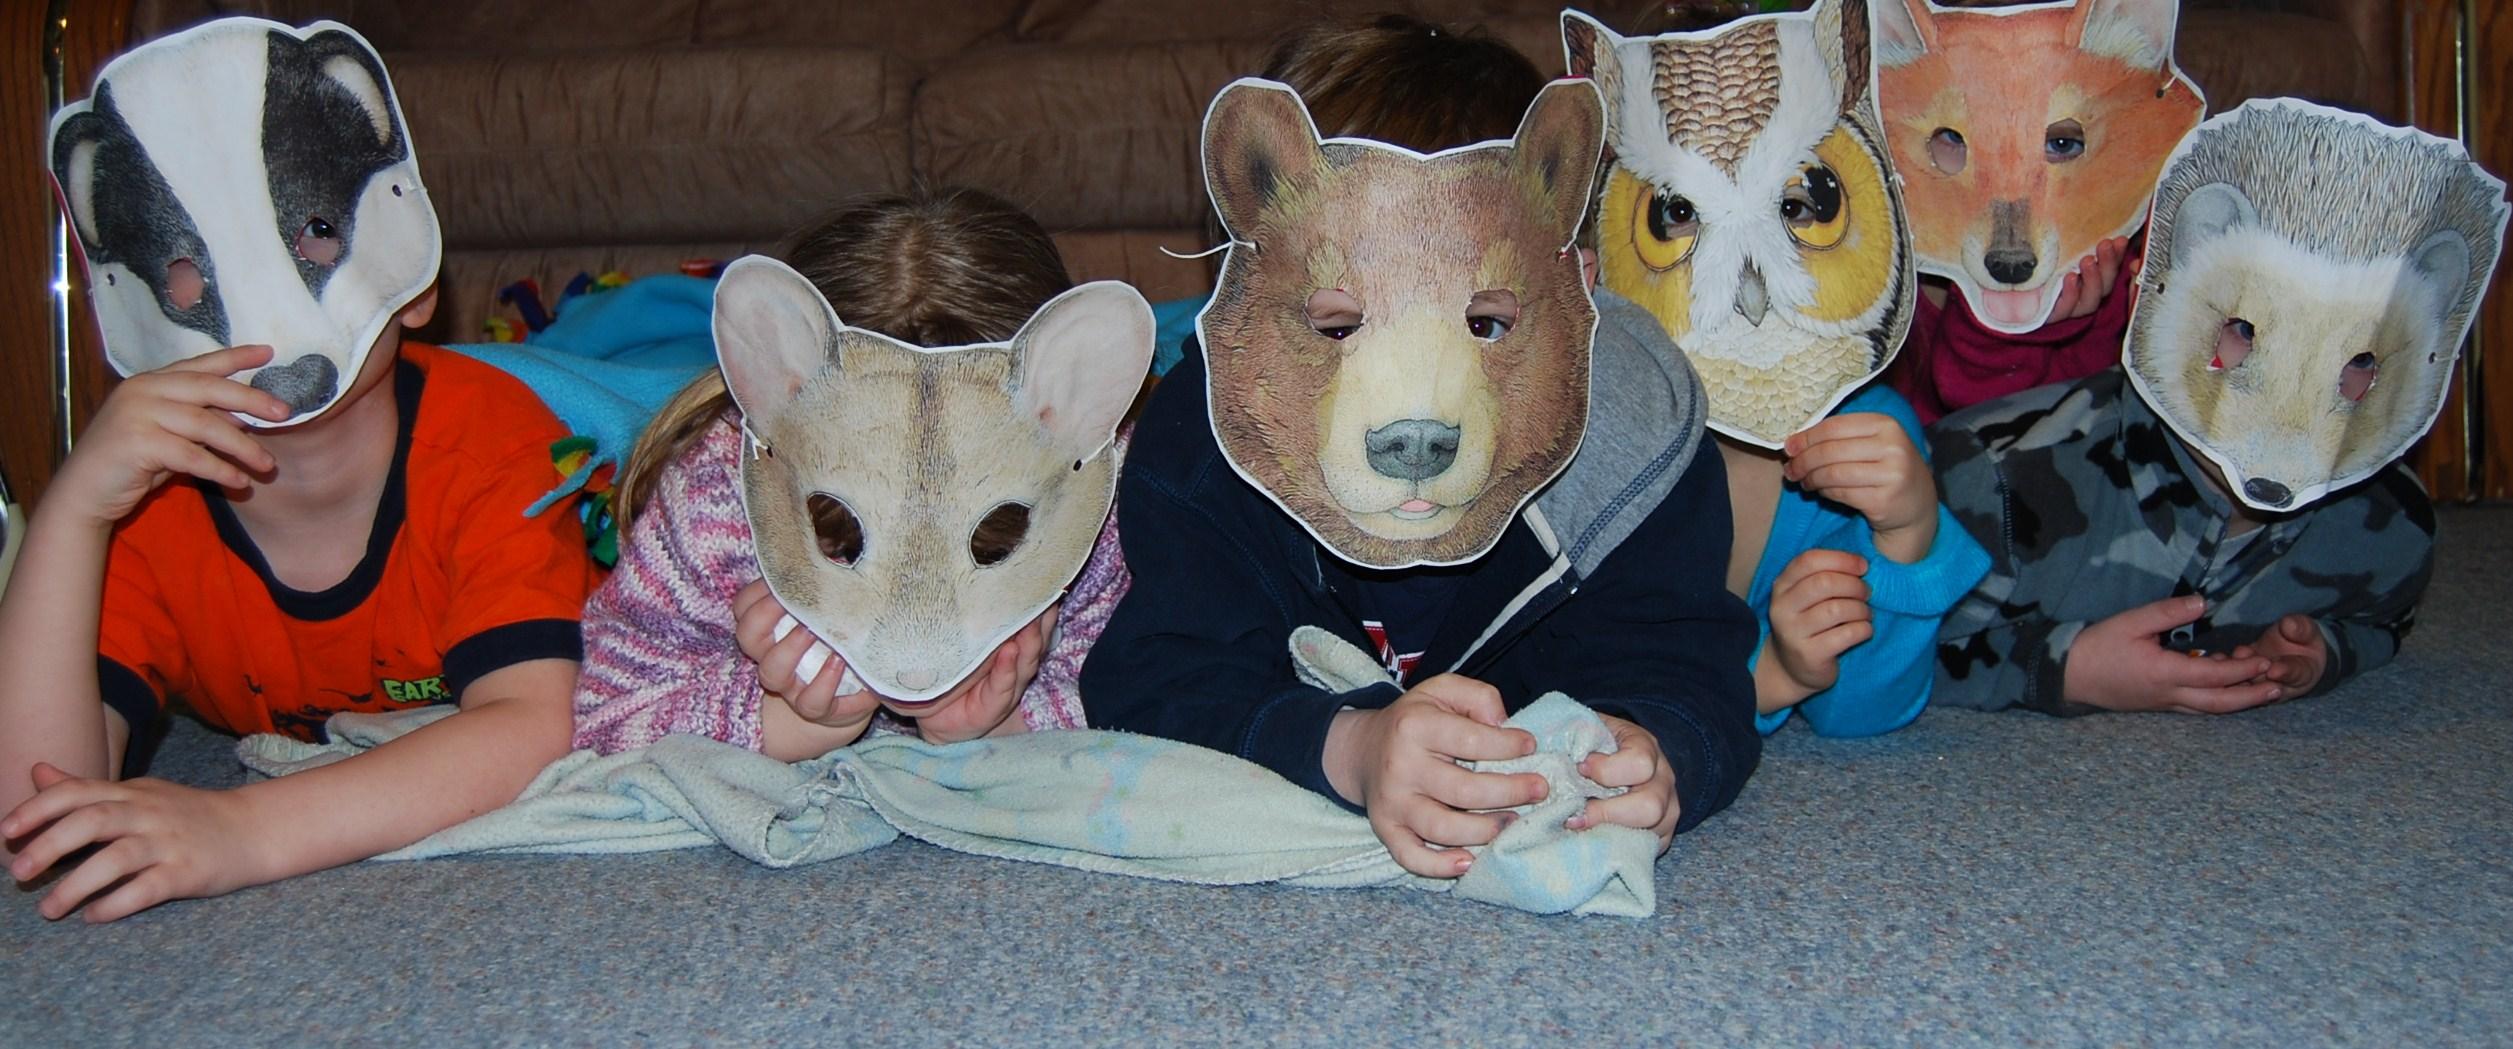 Extension activities for the mitten by jan brett the preschool